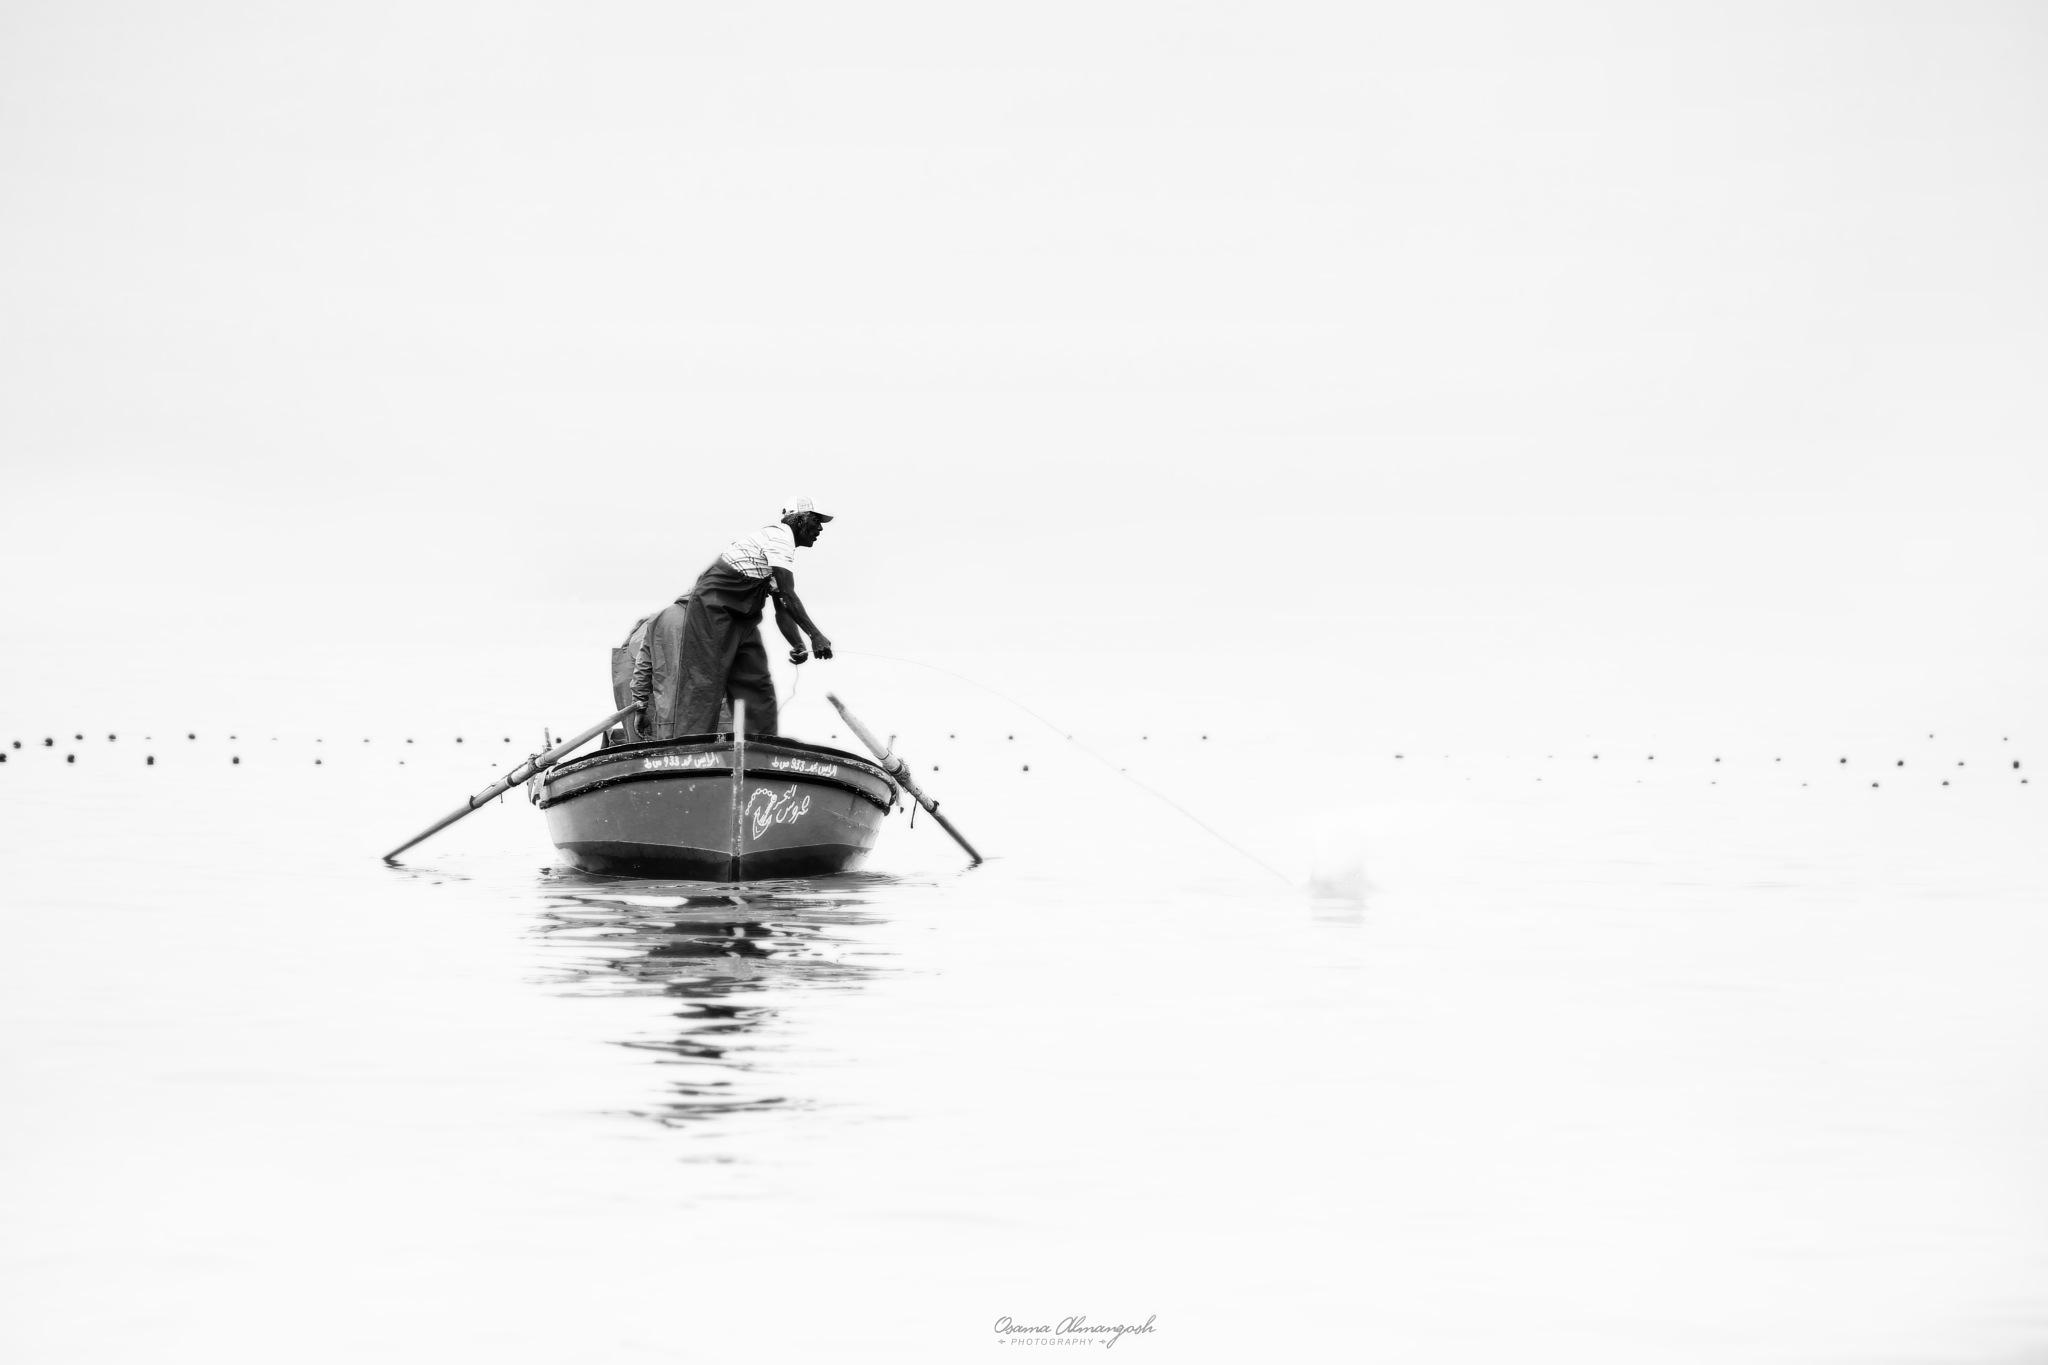 High Key by osama almngush